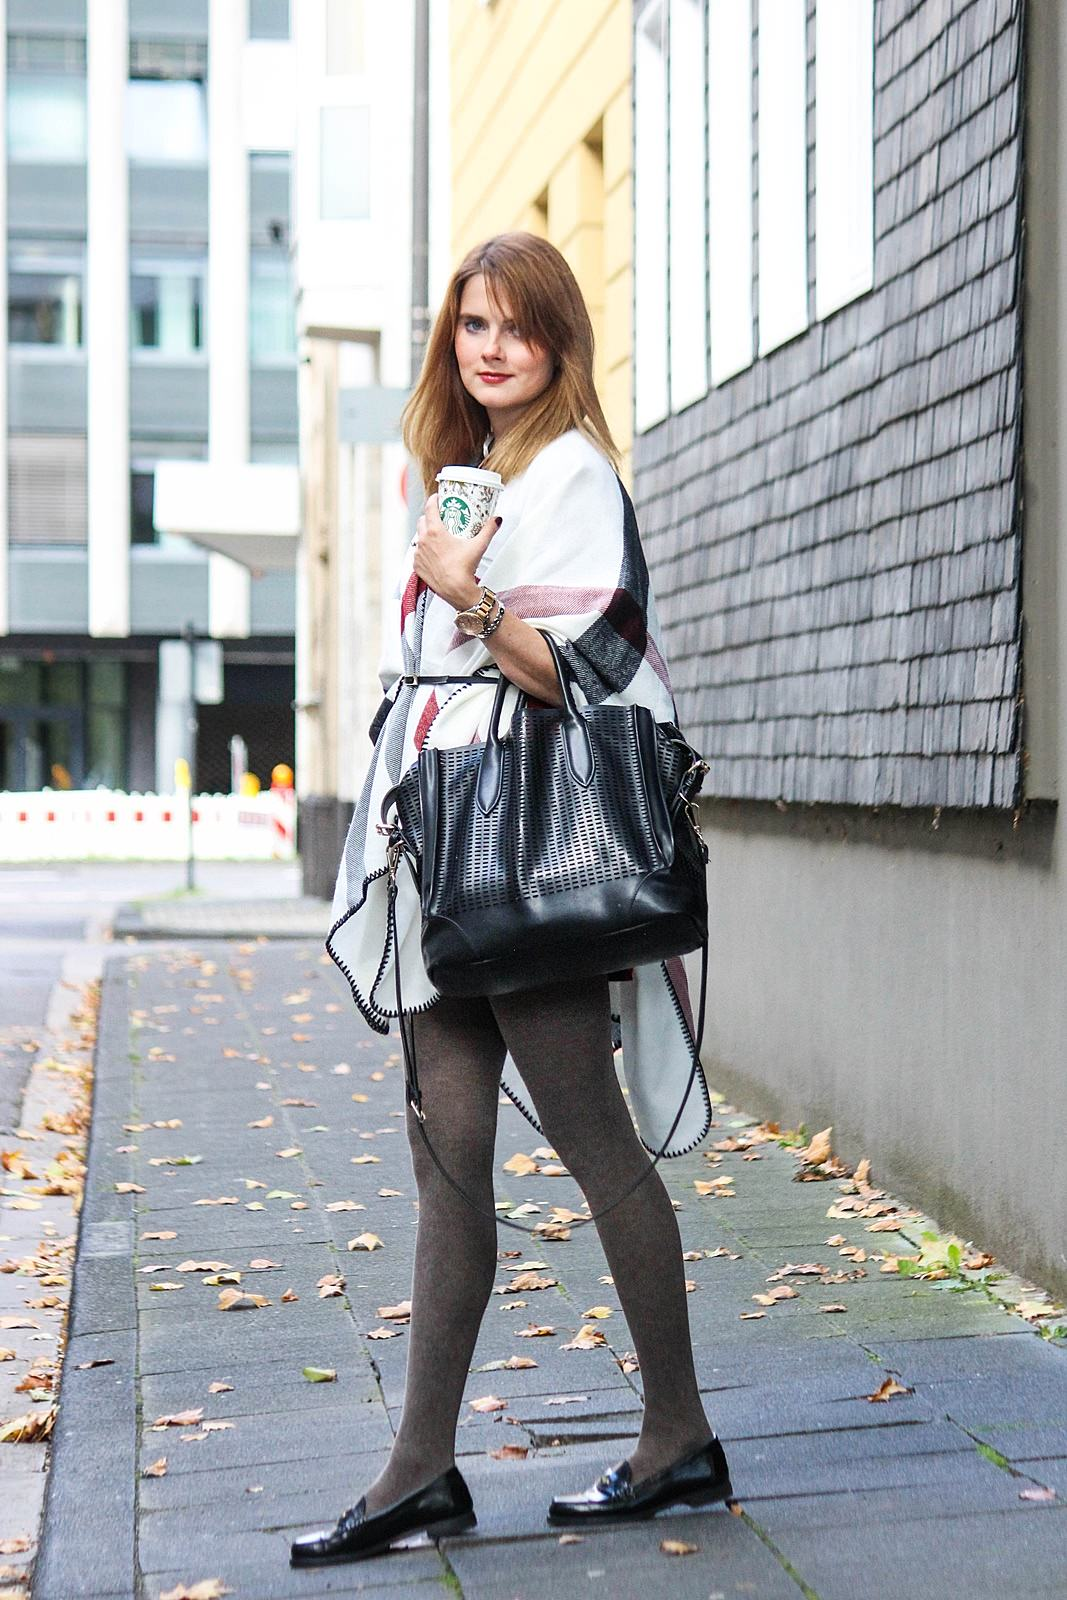 desbelleschoses-outfit-streetstyle-mit-kariertem-cape-suede-kleid-loafers 2